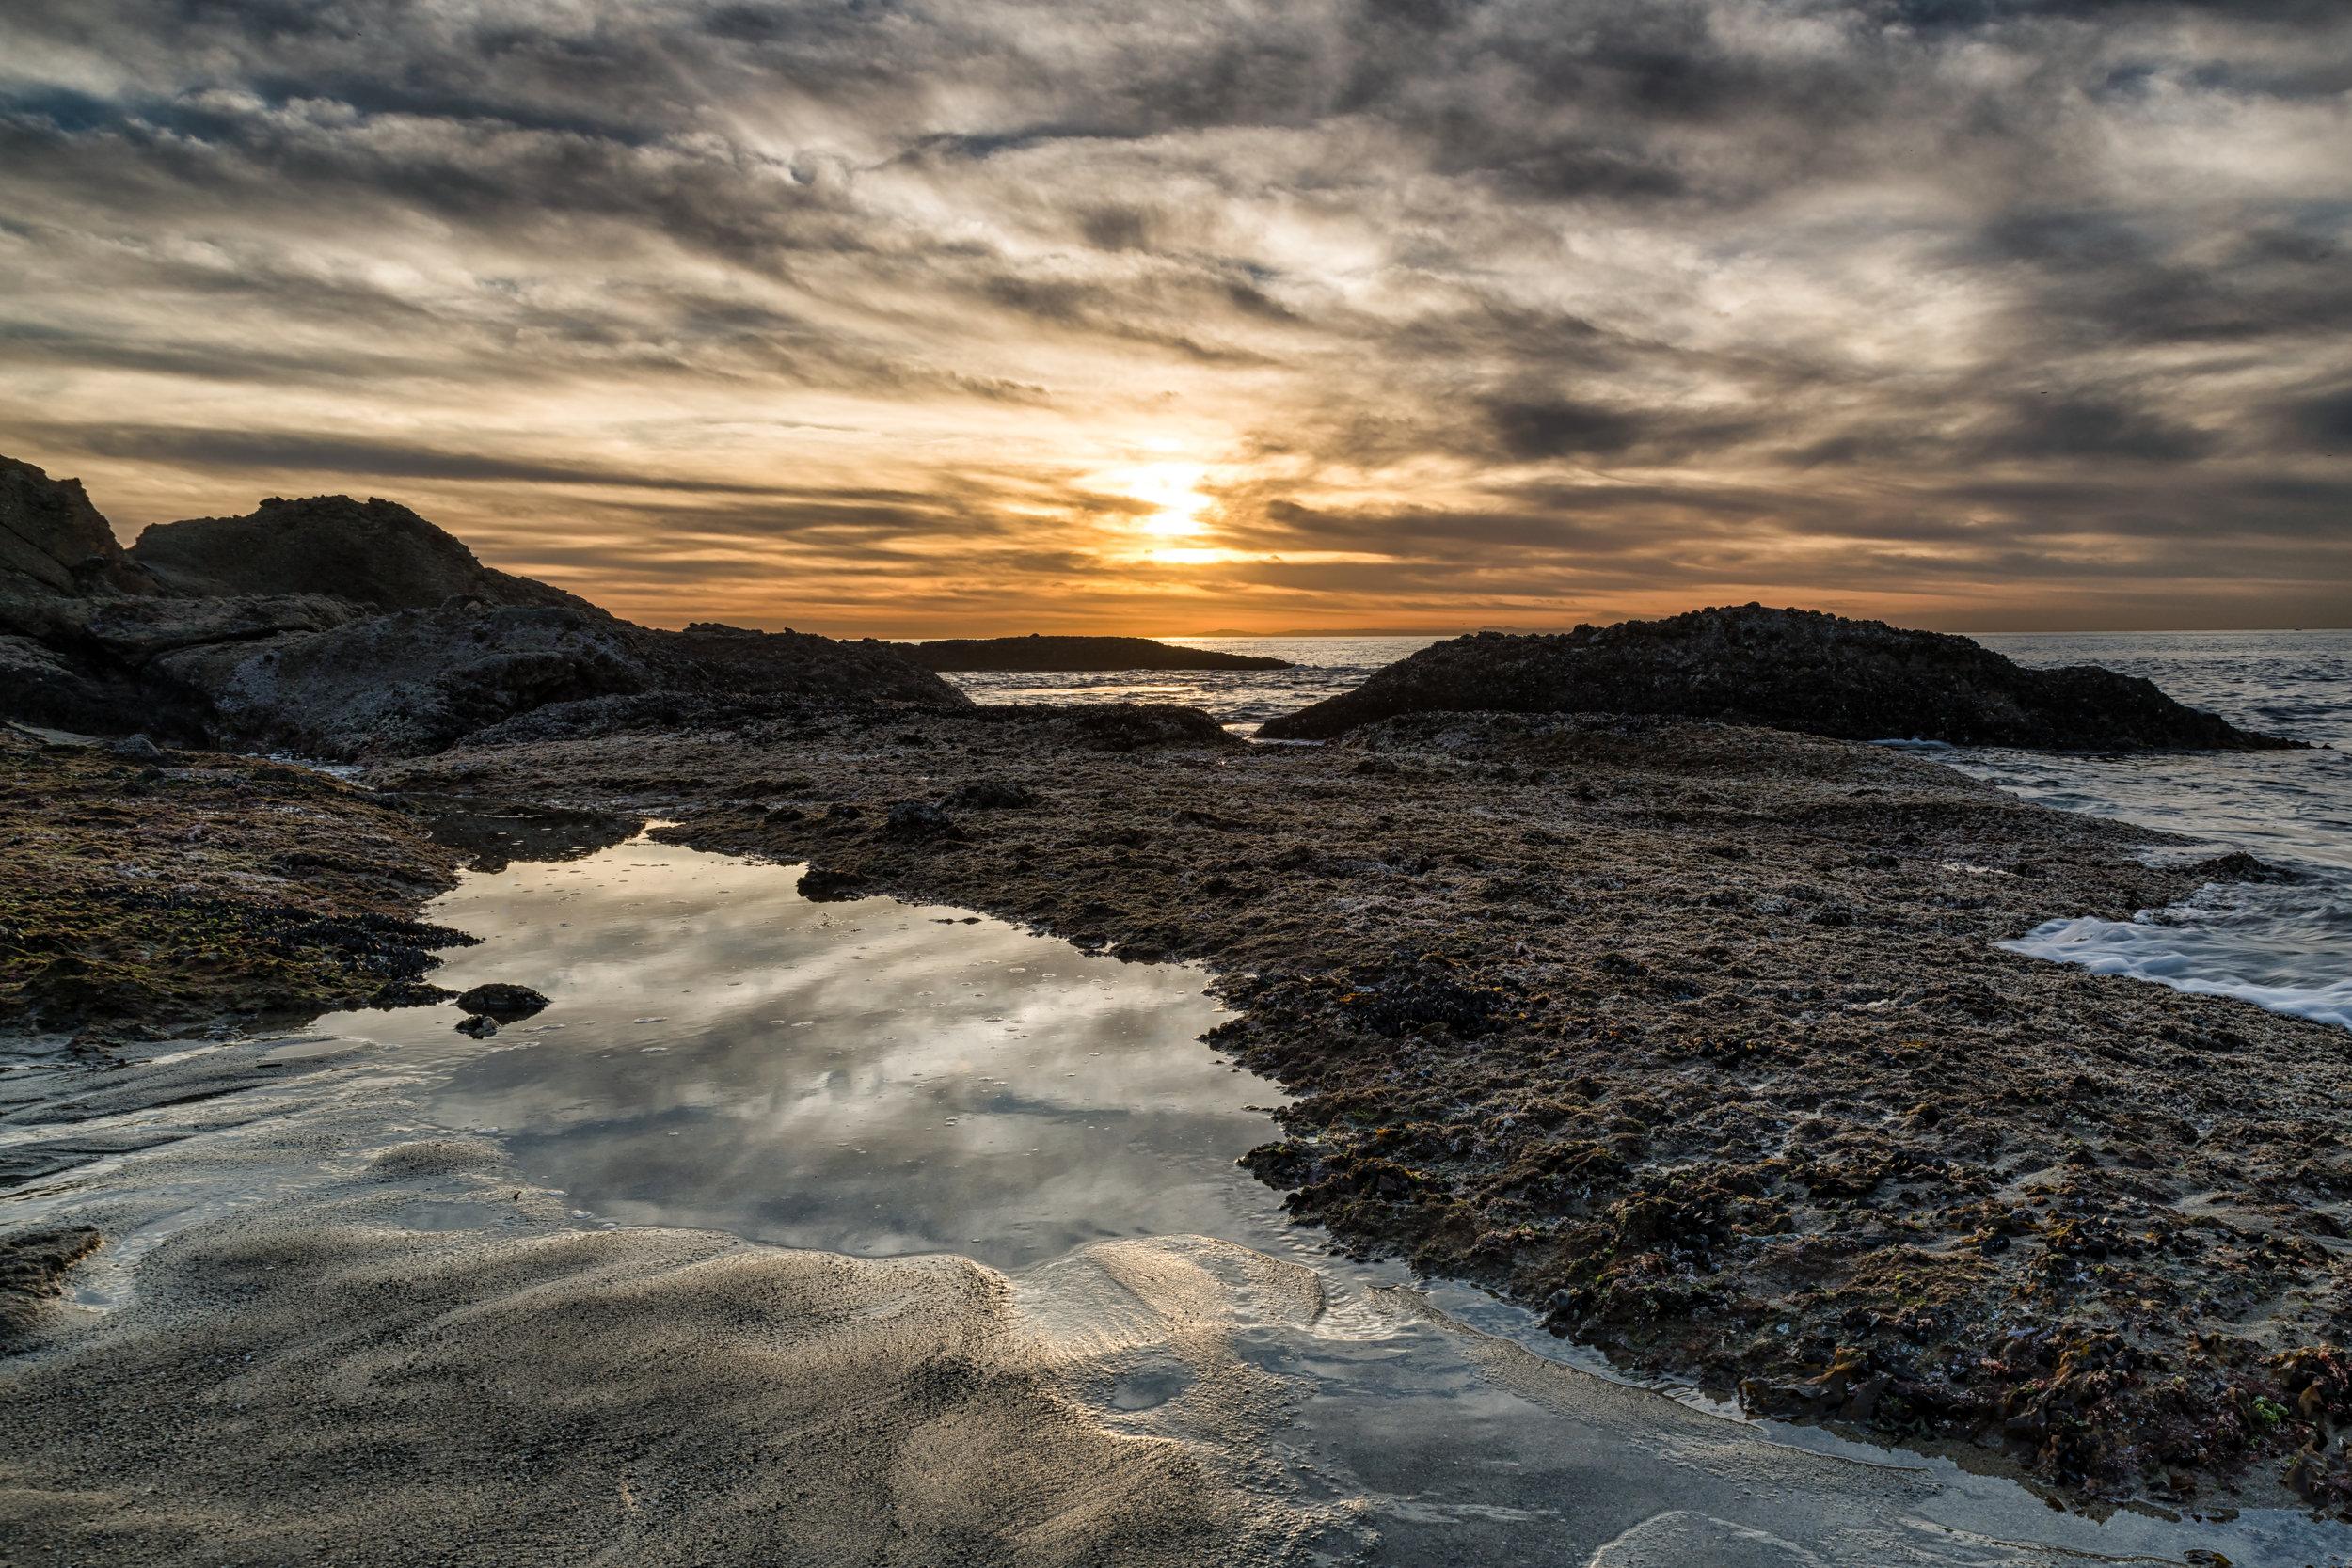 The tide rising at Laguna Beach during sunset.